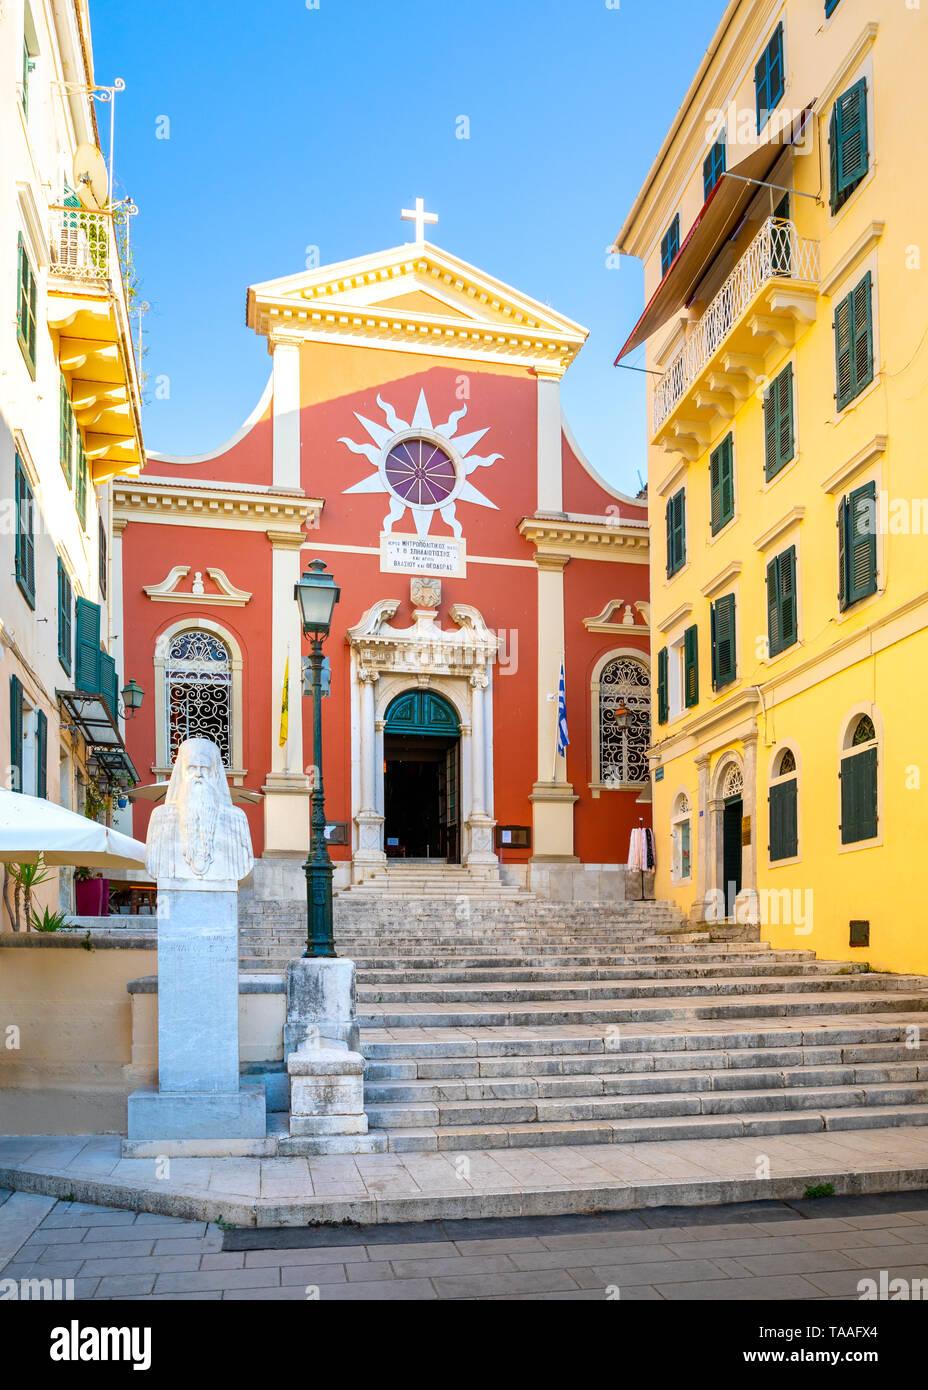 Agios Spyridonas Church Bell Tower, Corfu Old Town, Kerkyra, Corfu, Ionian Islands, Greece - Stock Image